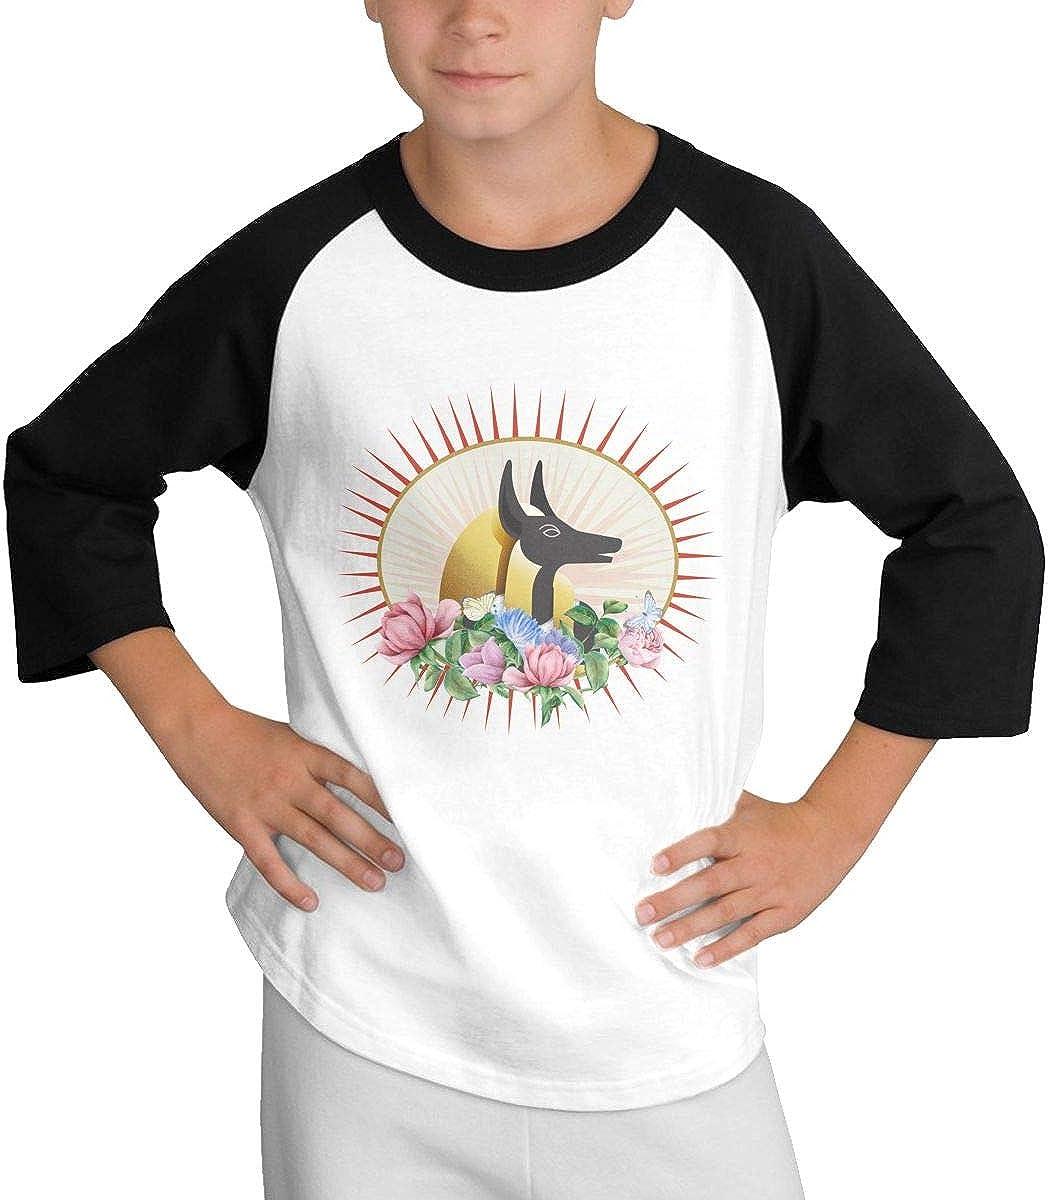 Zhangjinr Boys,Girls,Youth Kevin Gates Tee Shirt